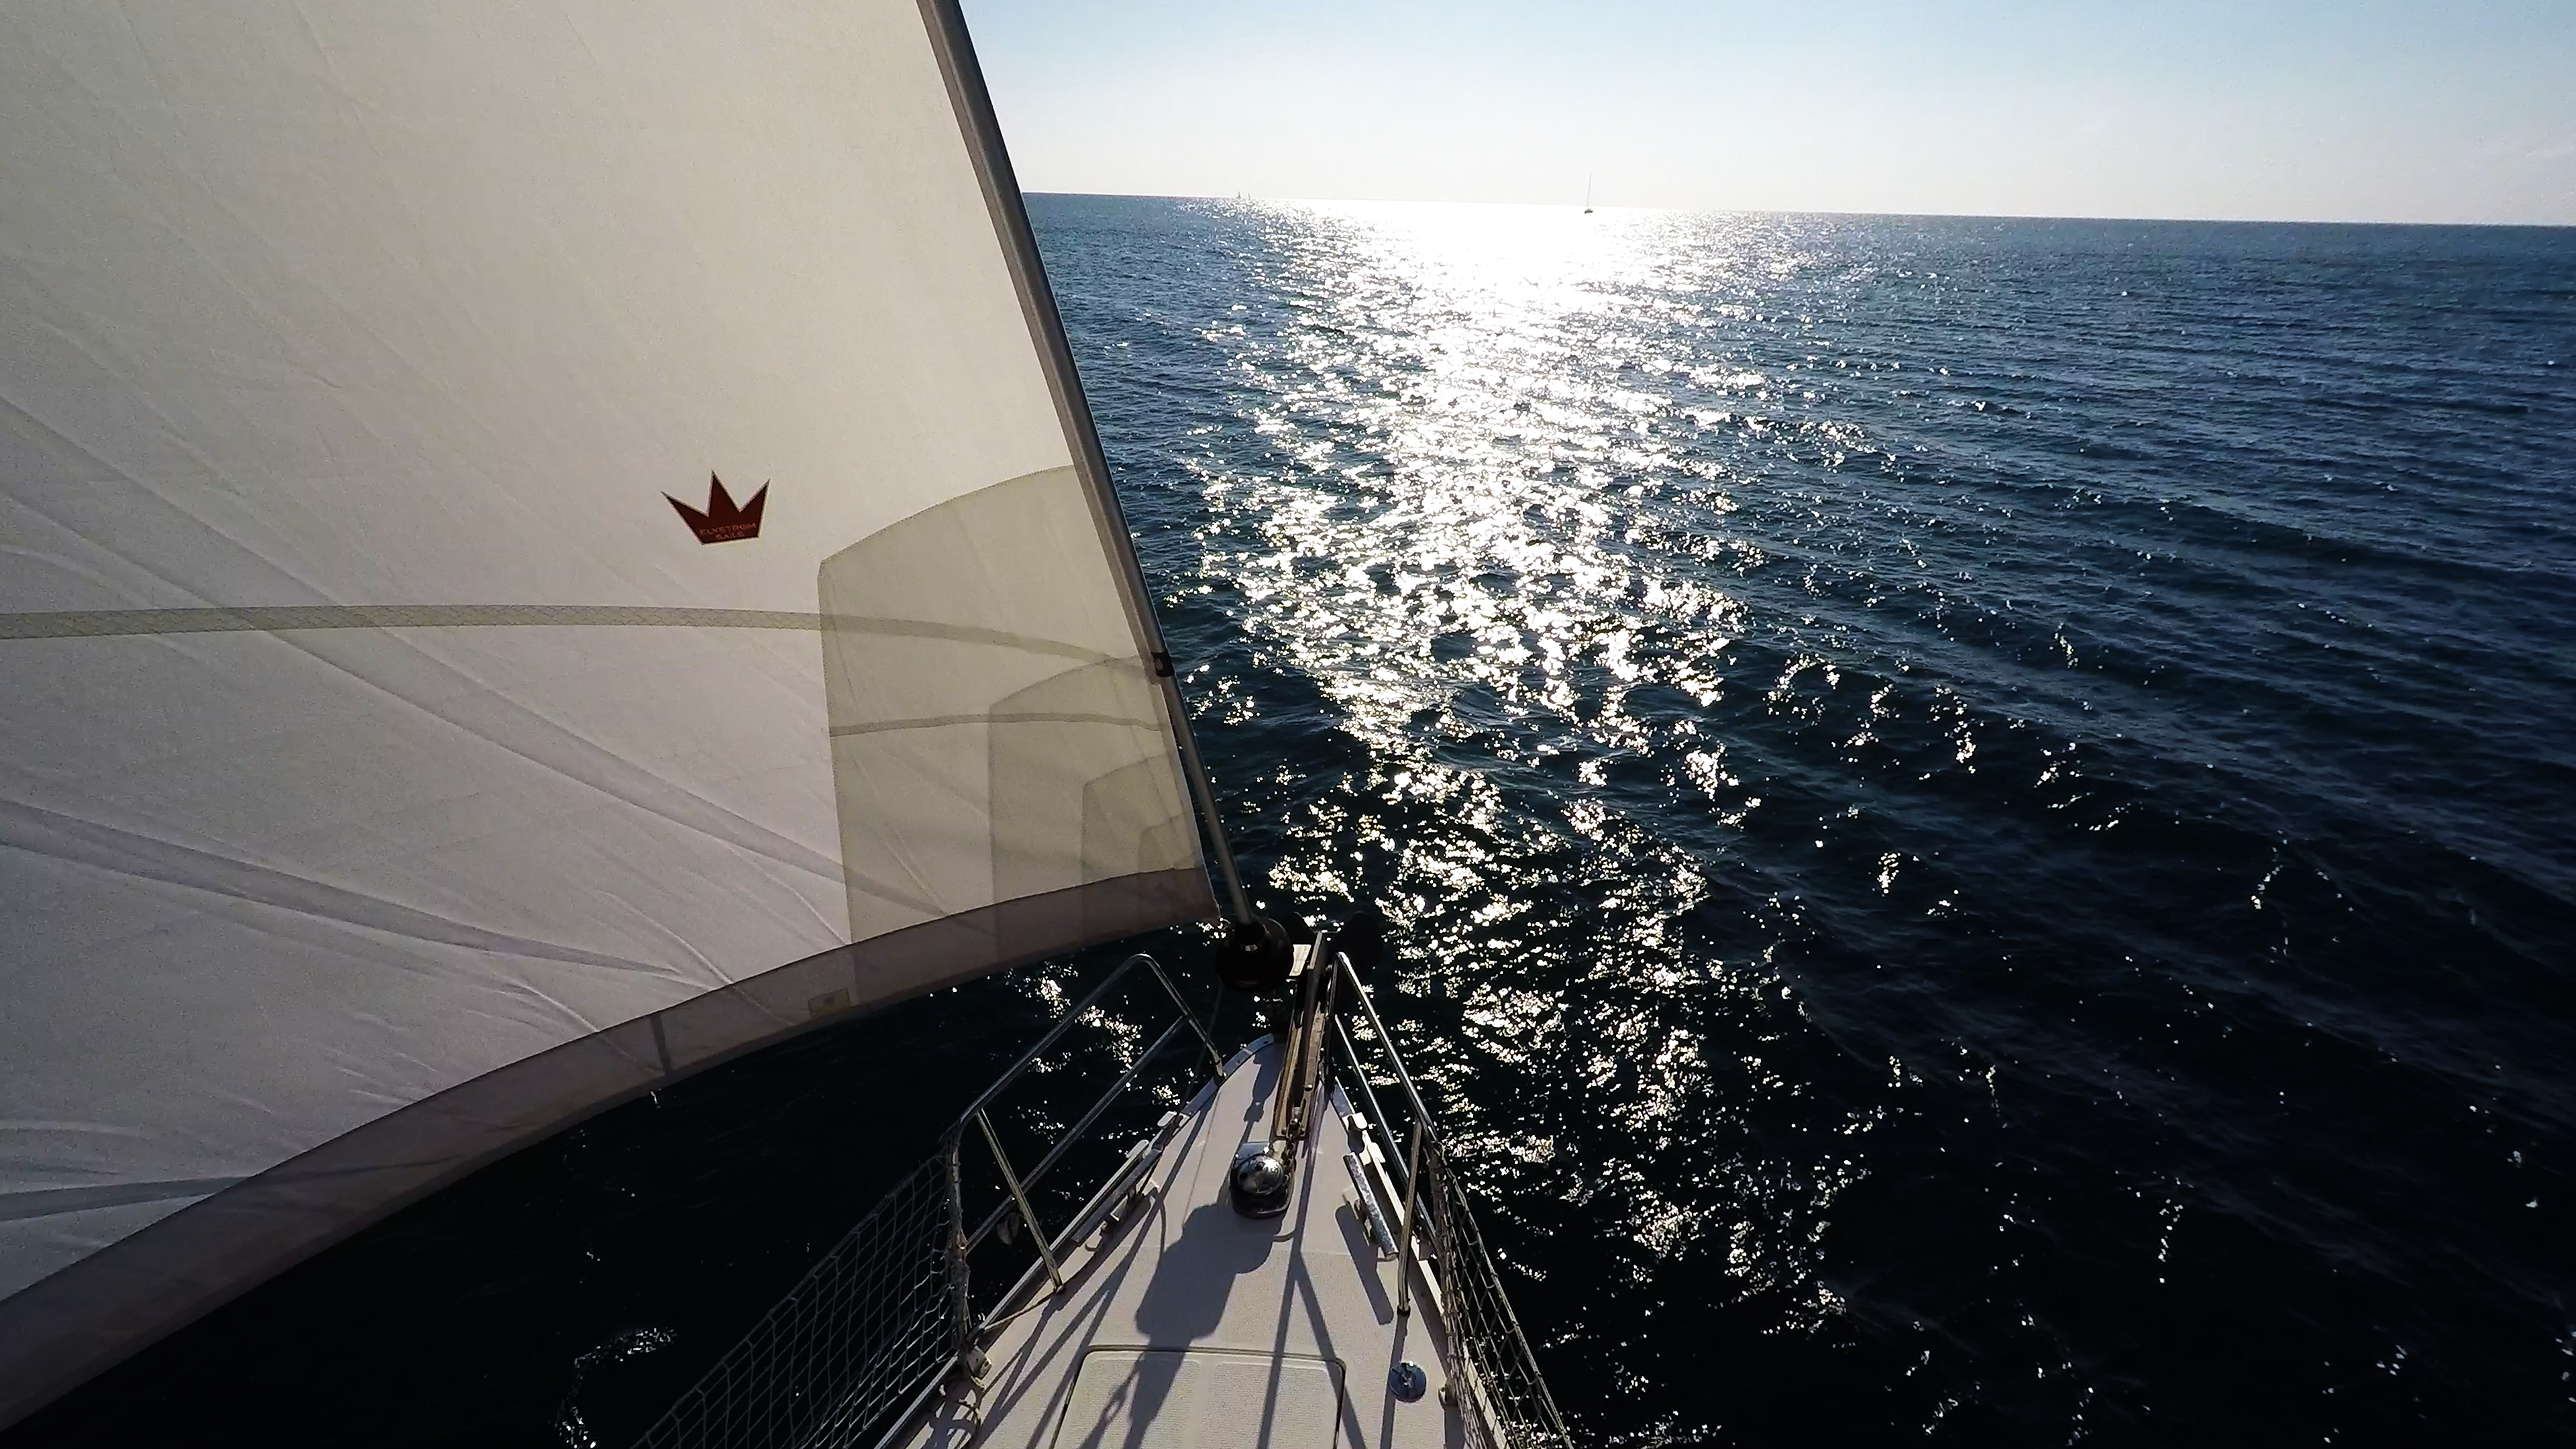 barcha a vela yacht a vela orizzonte genova rotolo prua mare sole